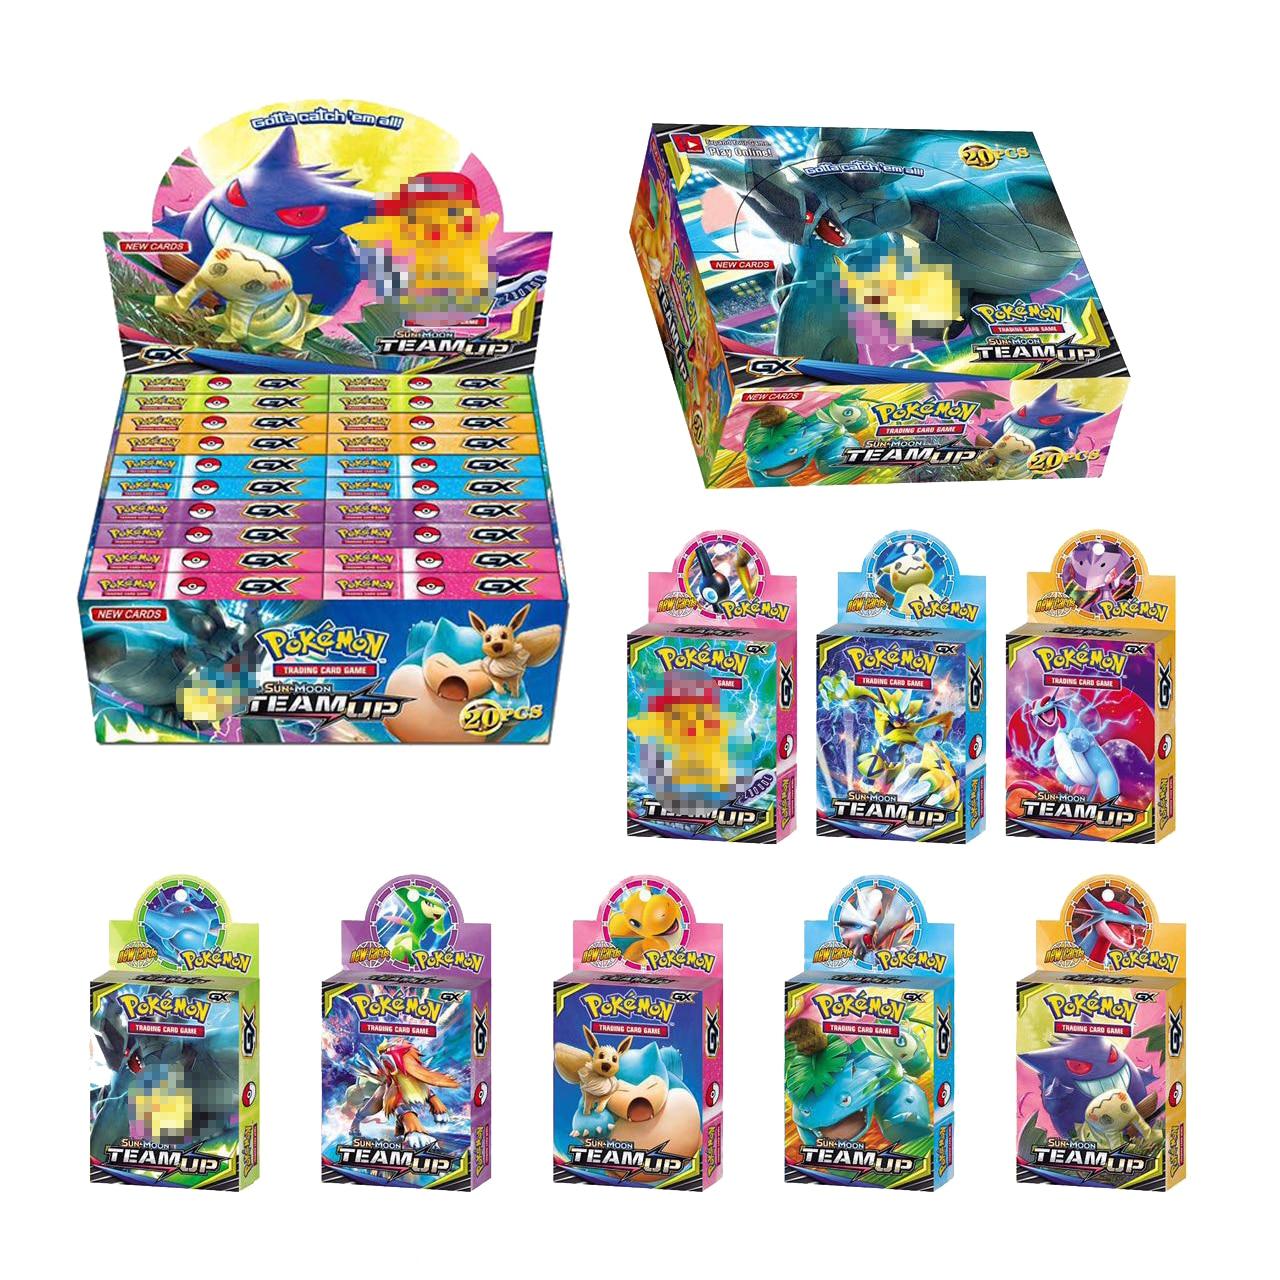 TAKARA TOMY Pokemon 33PCS GX EX MEGA Flash Card 3D Version Sword Shield Sun Moon Card Collectible For Kids Christmas Gifts